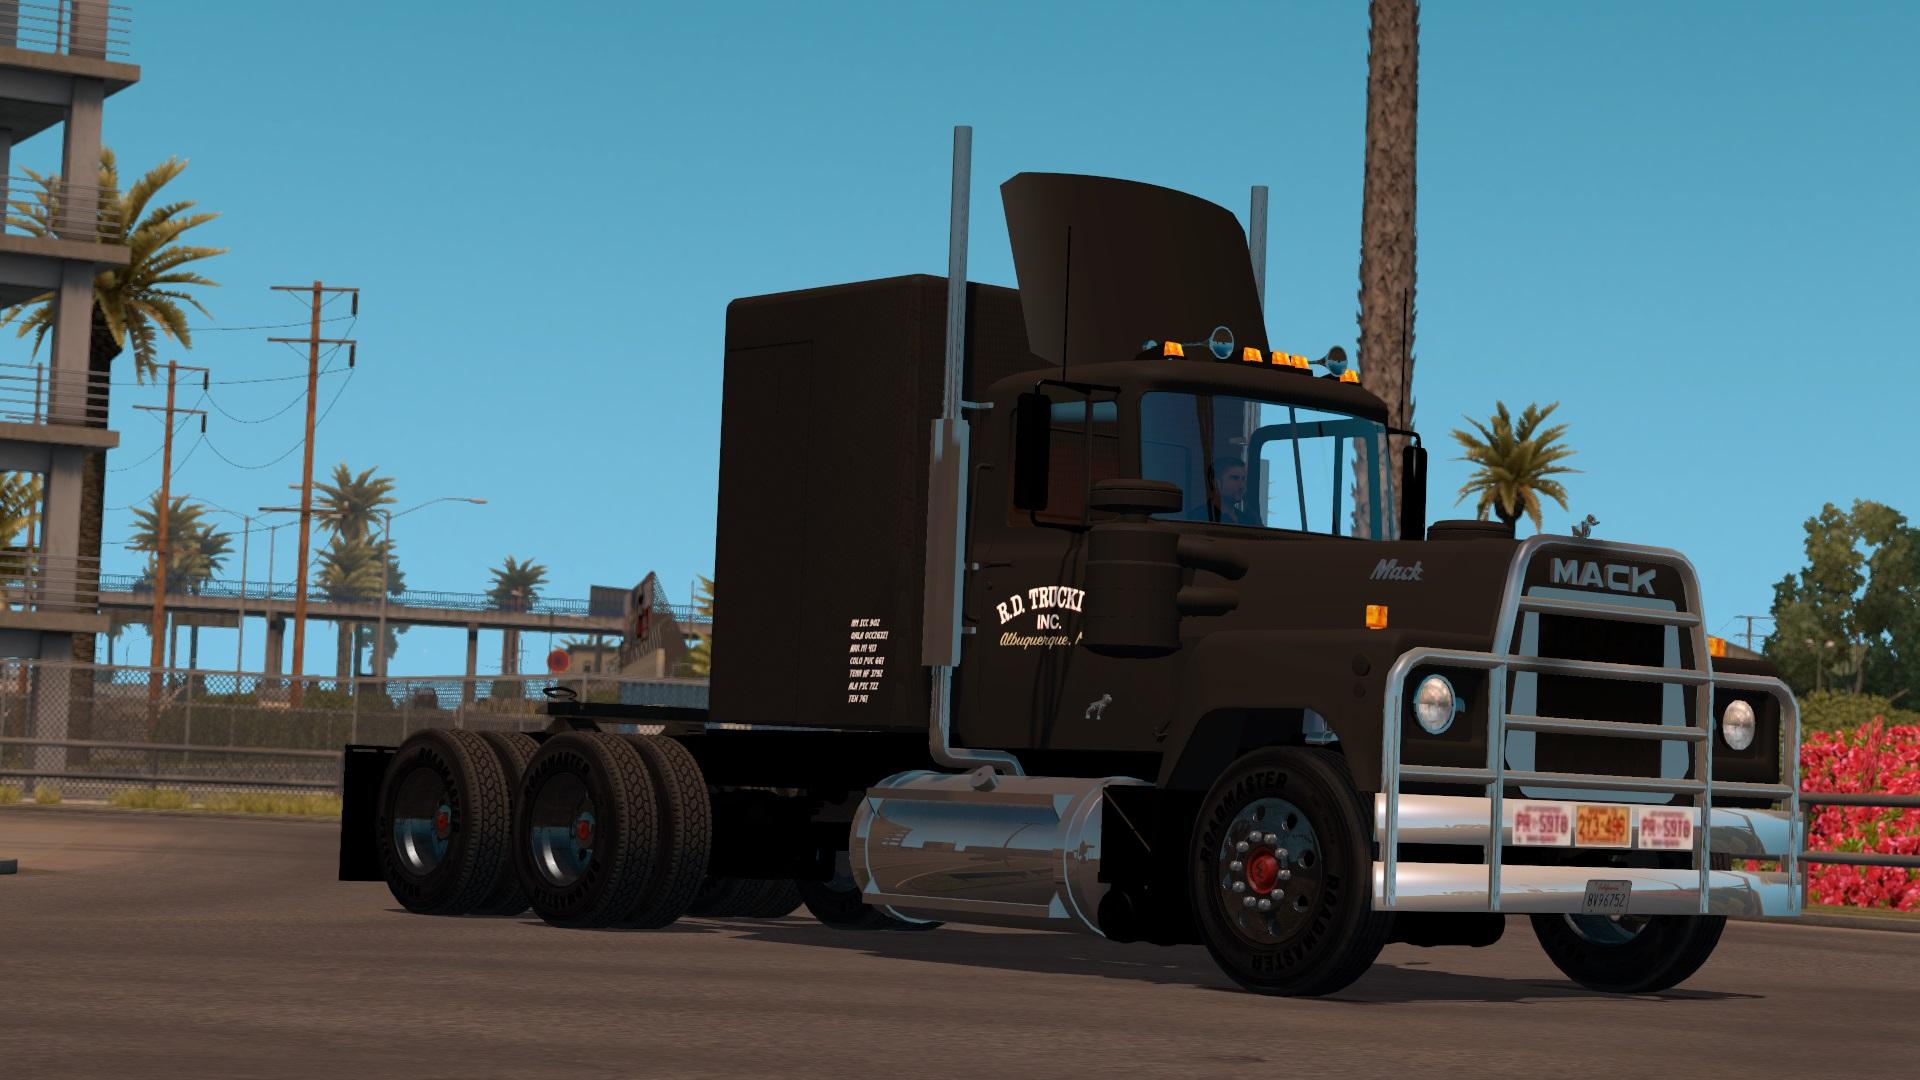 Mack Rs700 Convoy Truck Euro Truck Simulator 2 Mods